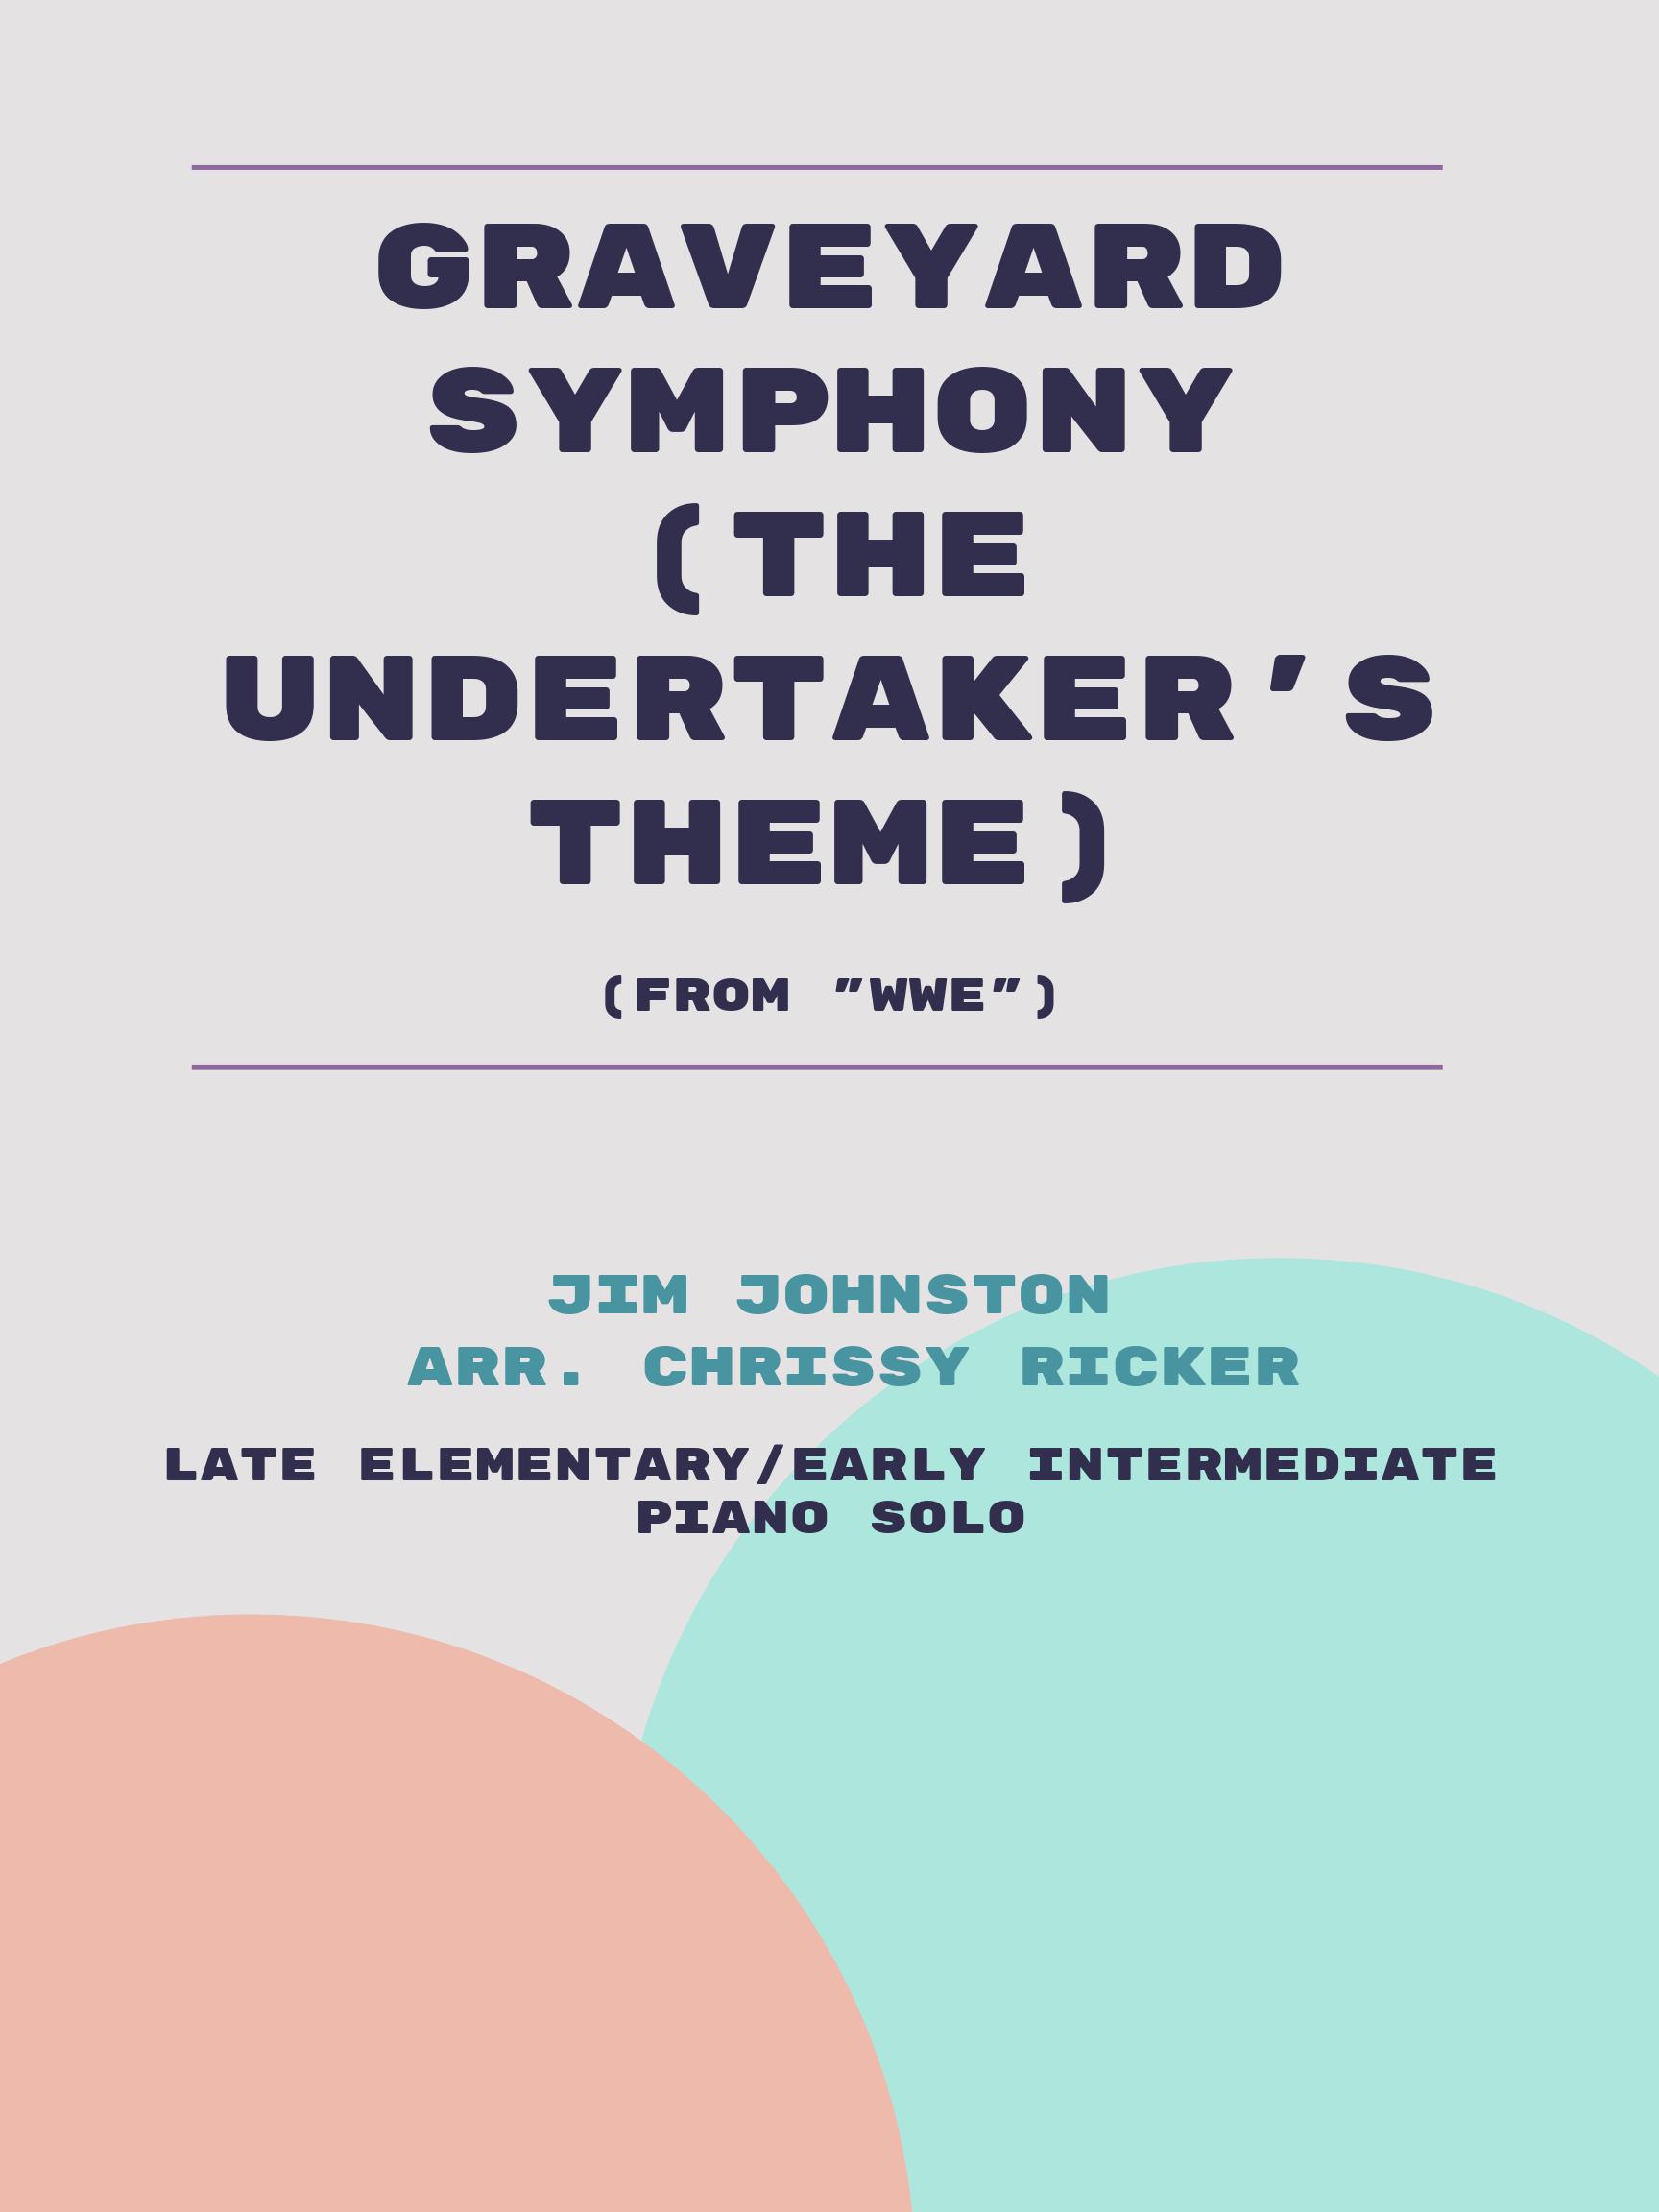 Graveyard Symphony (The Undertaker's Theme) Sample Page